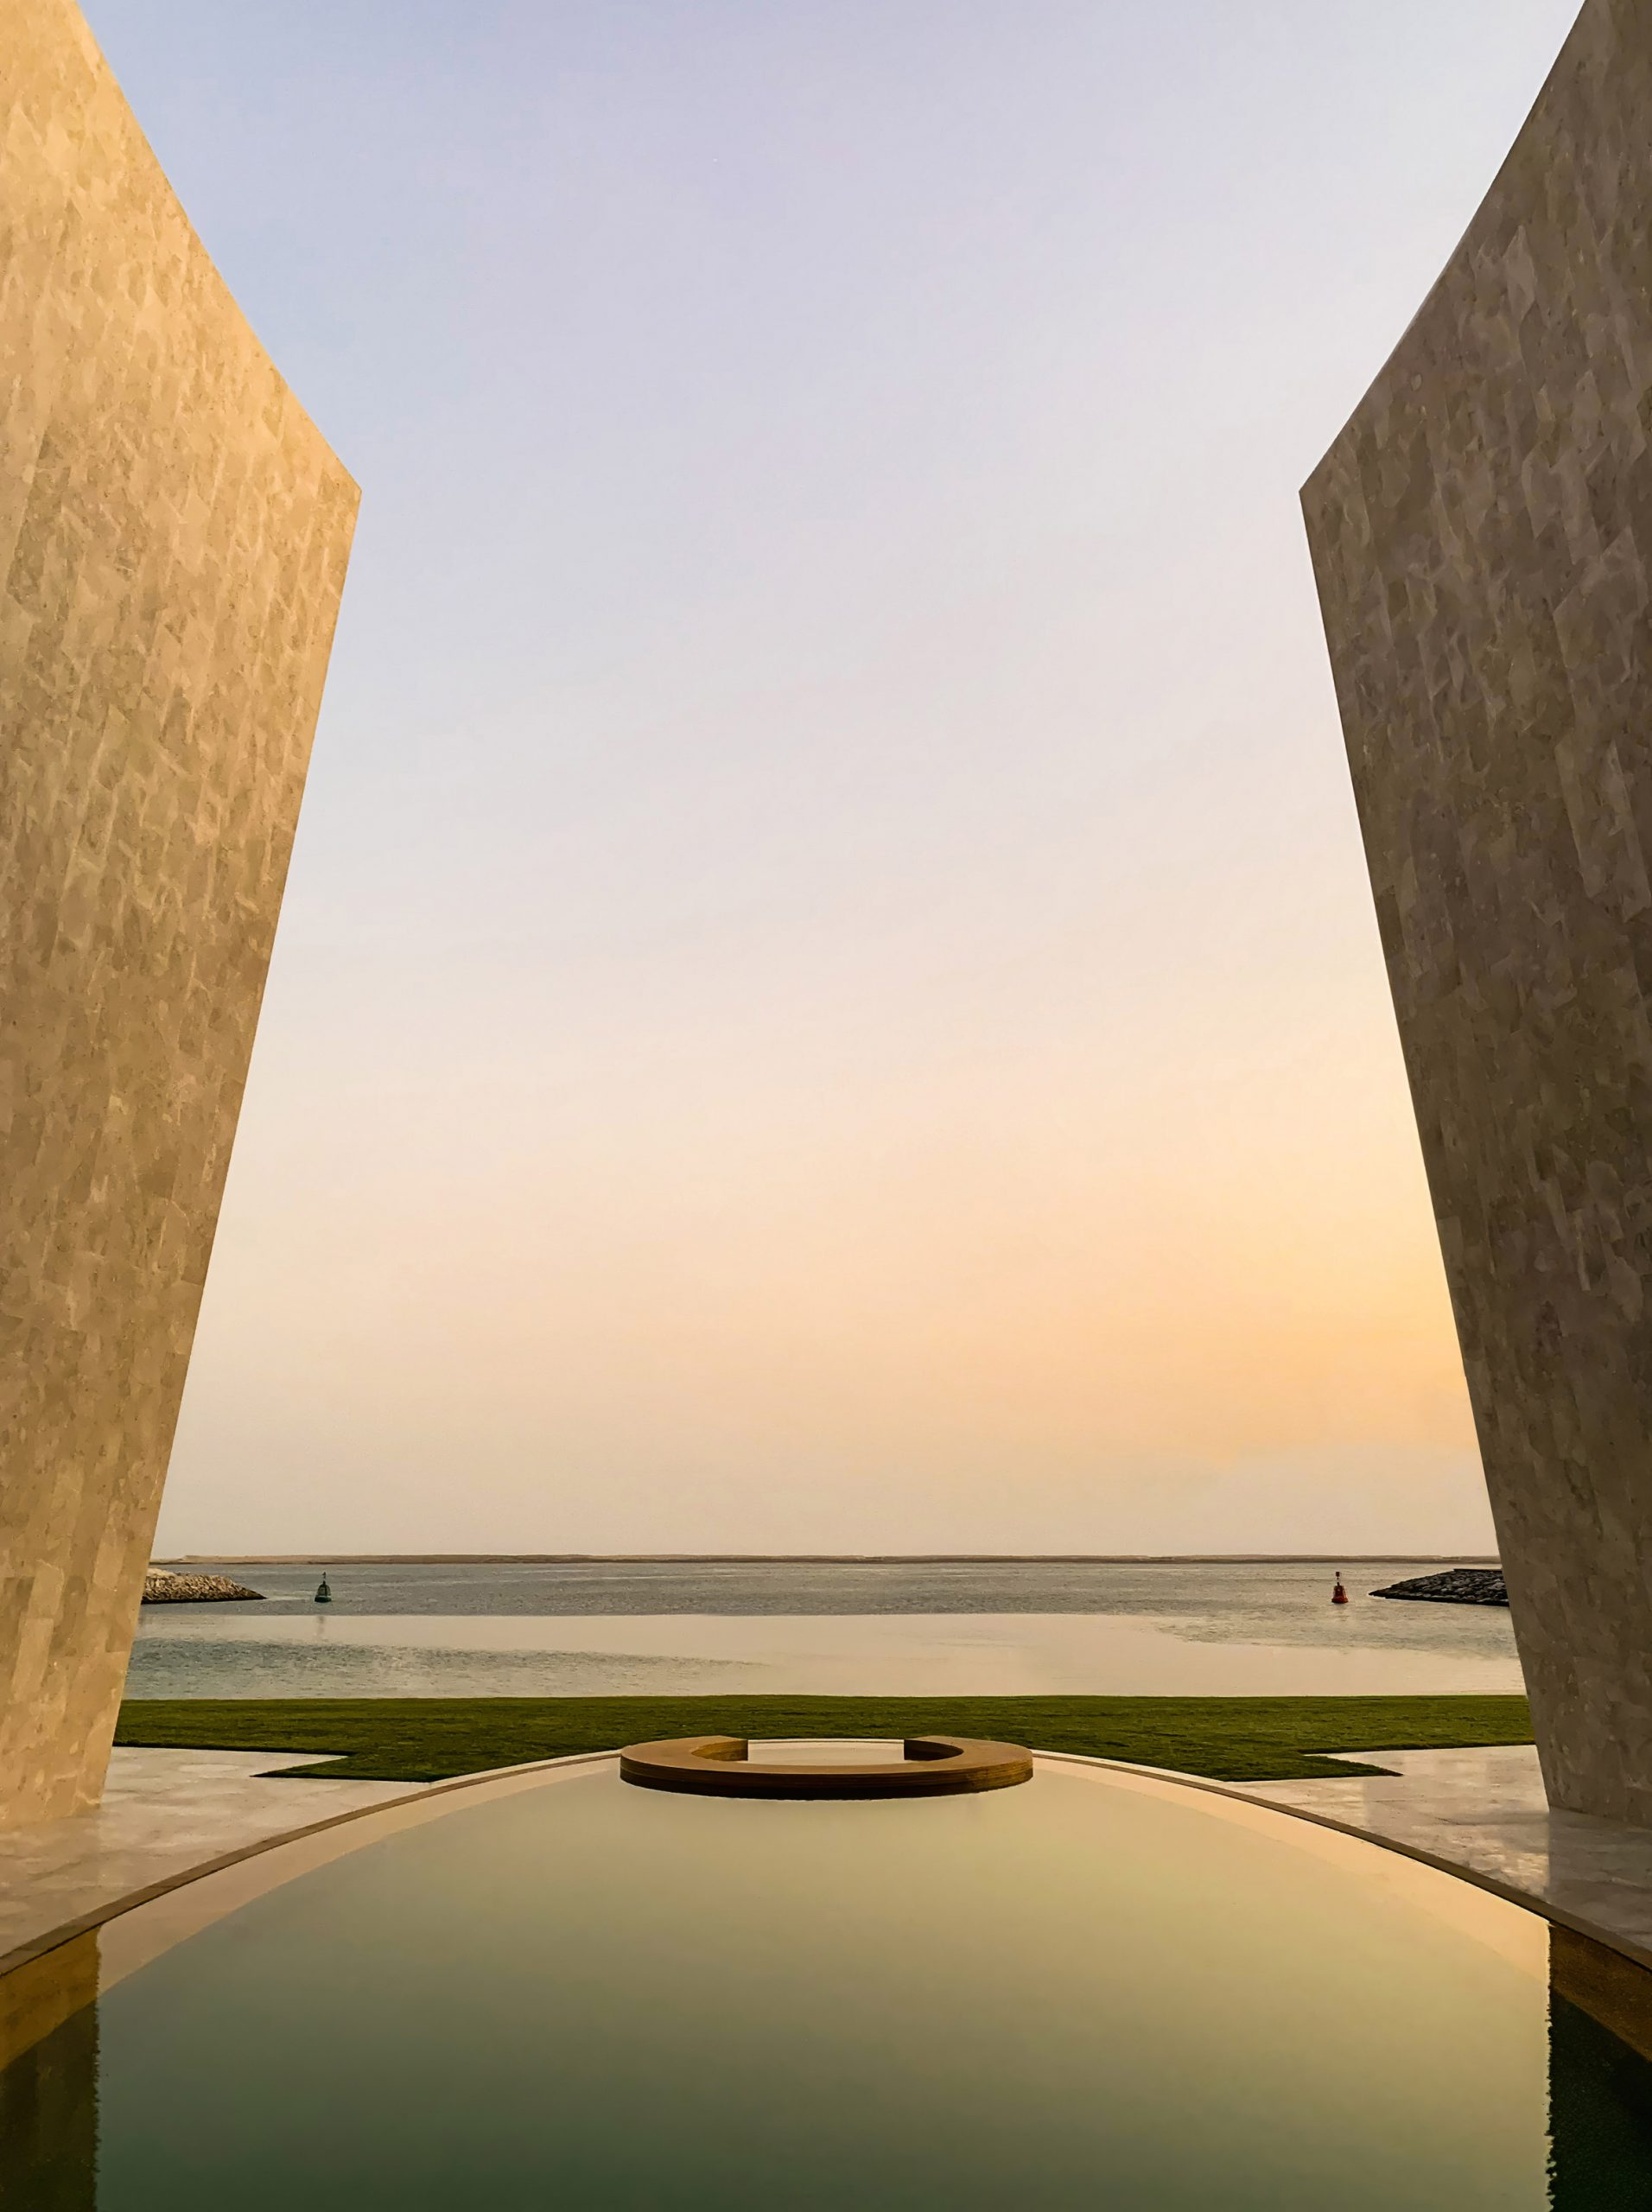 Villa on an artificial island in Abu Dhabi by Fabio Novembre